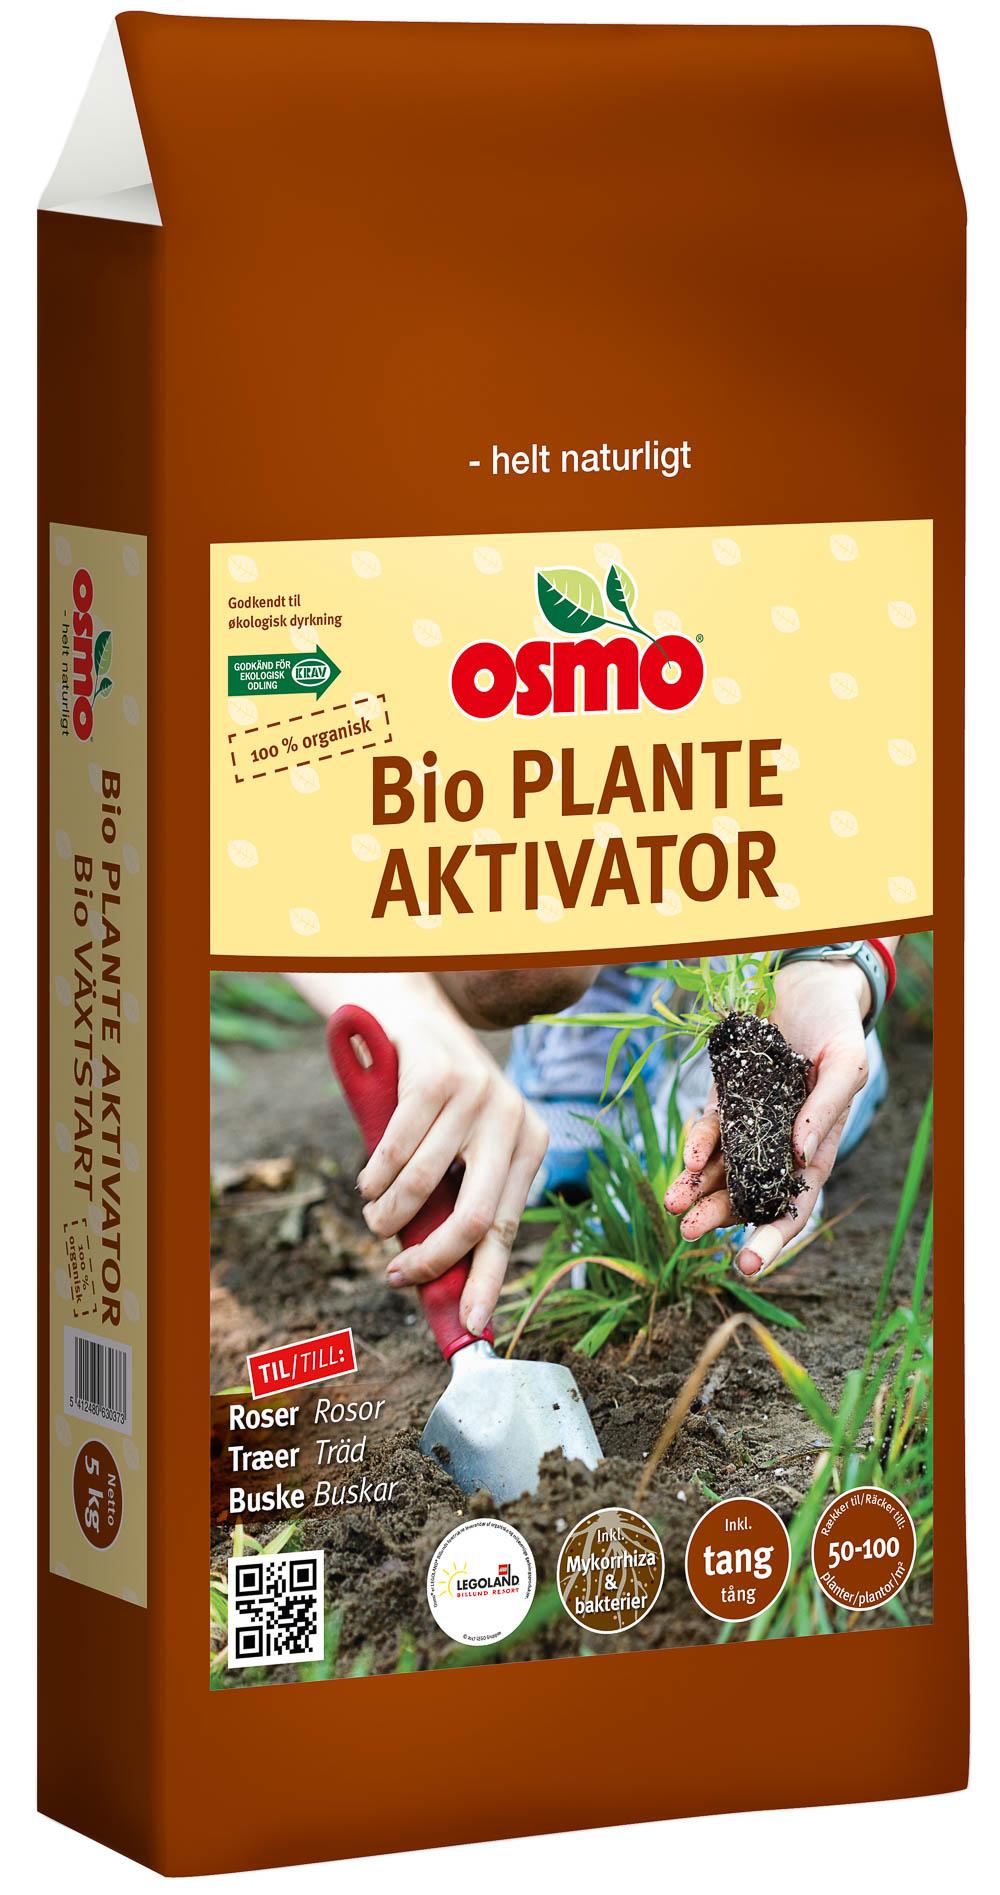 Osmo Bio Plante AKTIVATOR m/mykorrhiza